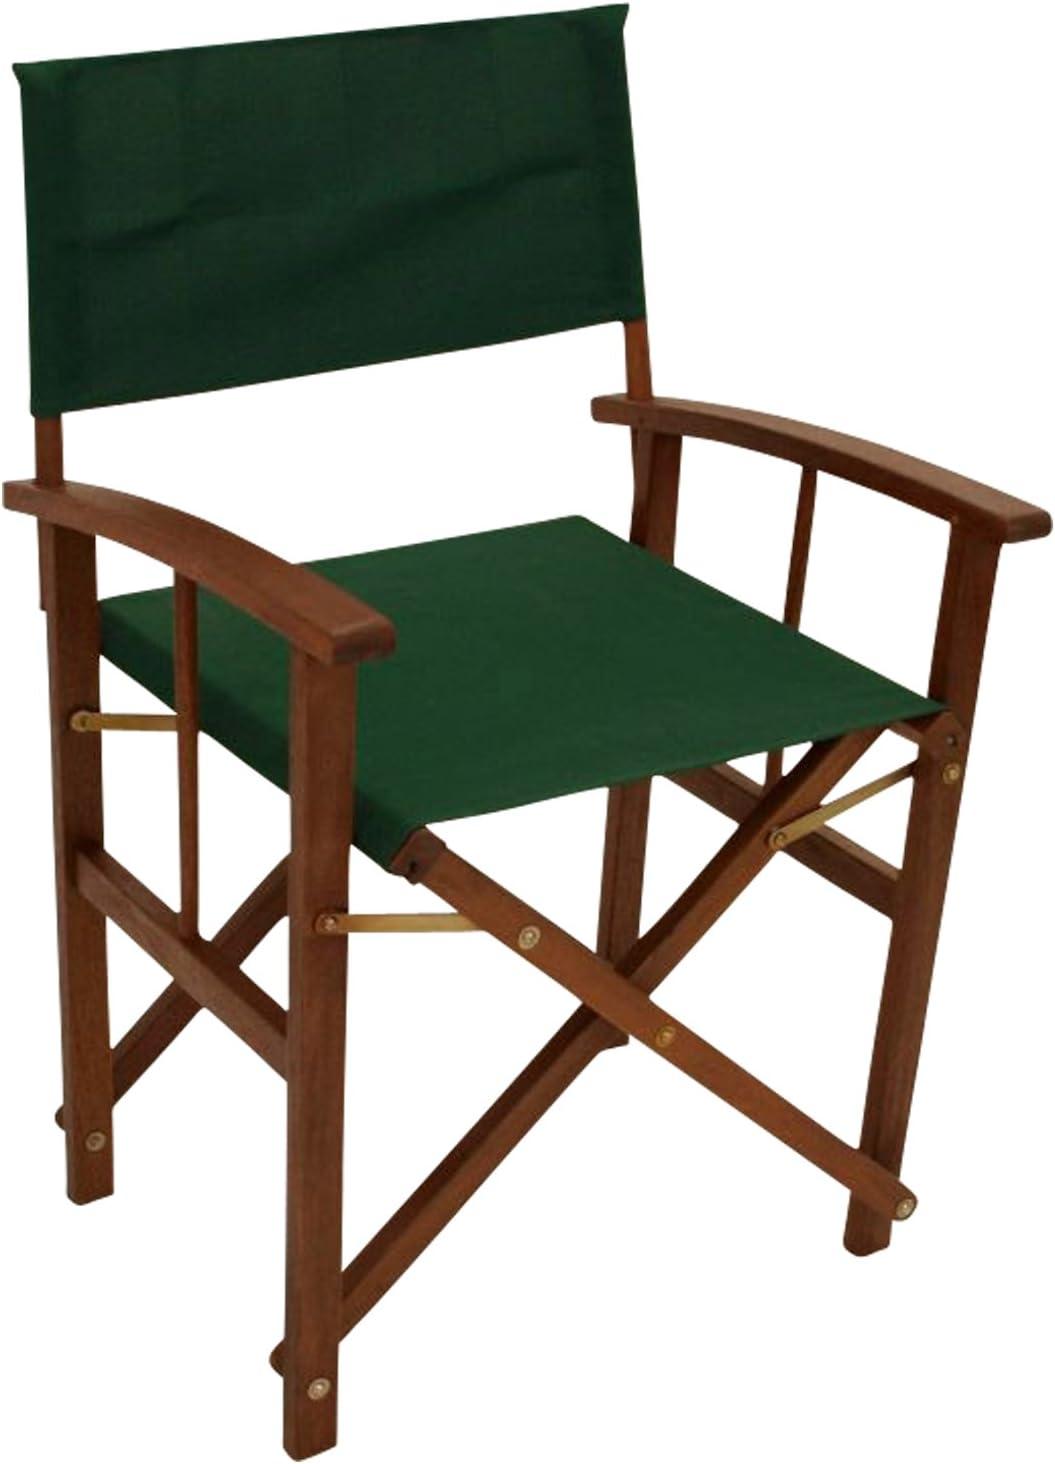 Holz extra stabil Regiesessel XL Regiestuhl Klappstuhl Gartenstuhl CALIFORNIA